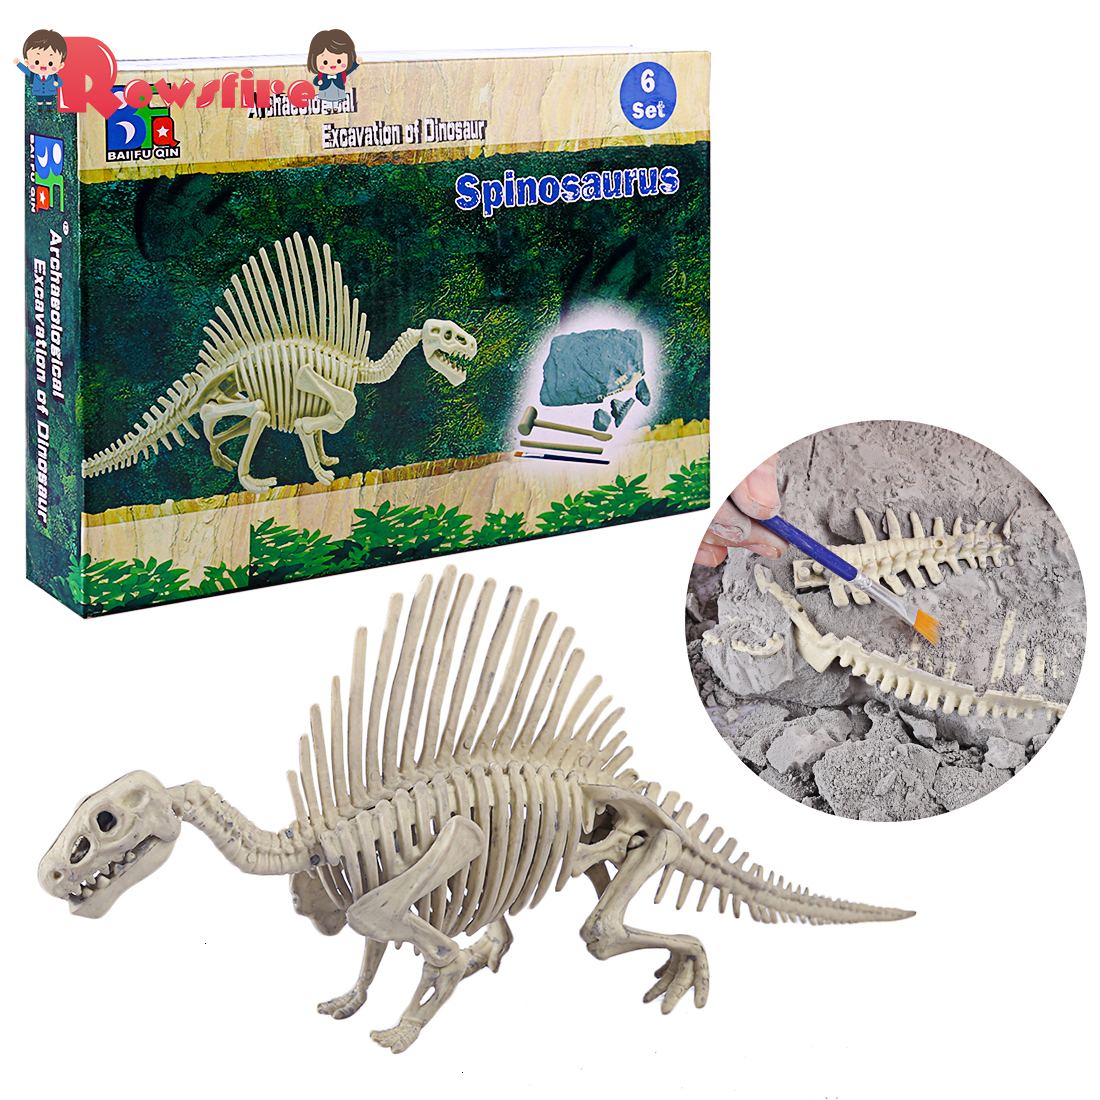 New Children Creative Educational Dinosaur Archaeology Excavation Toys - Spinosaurus  Ceratosaurus